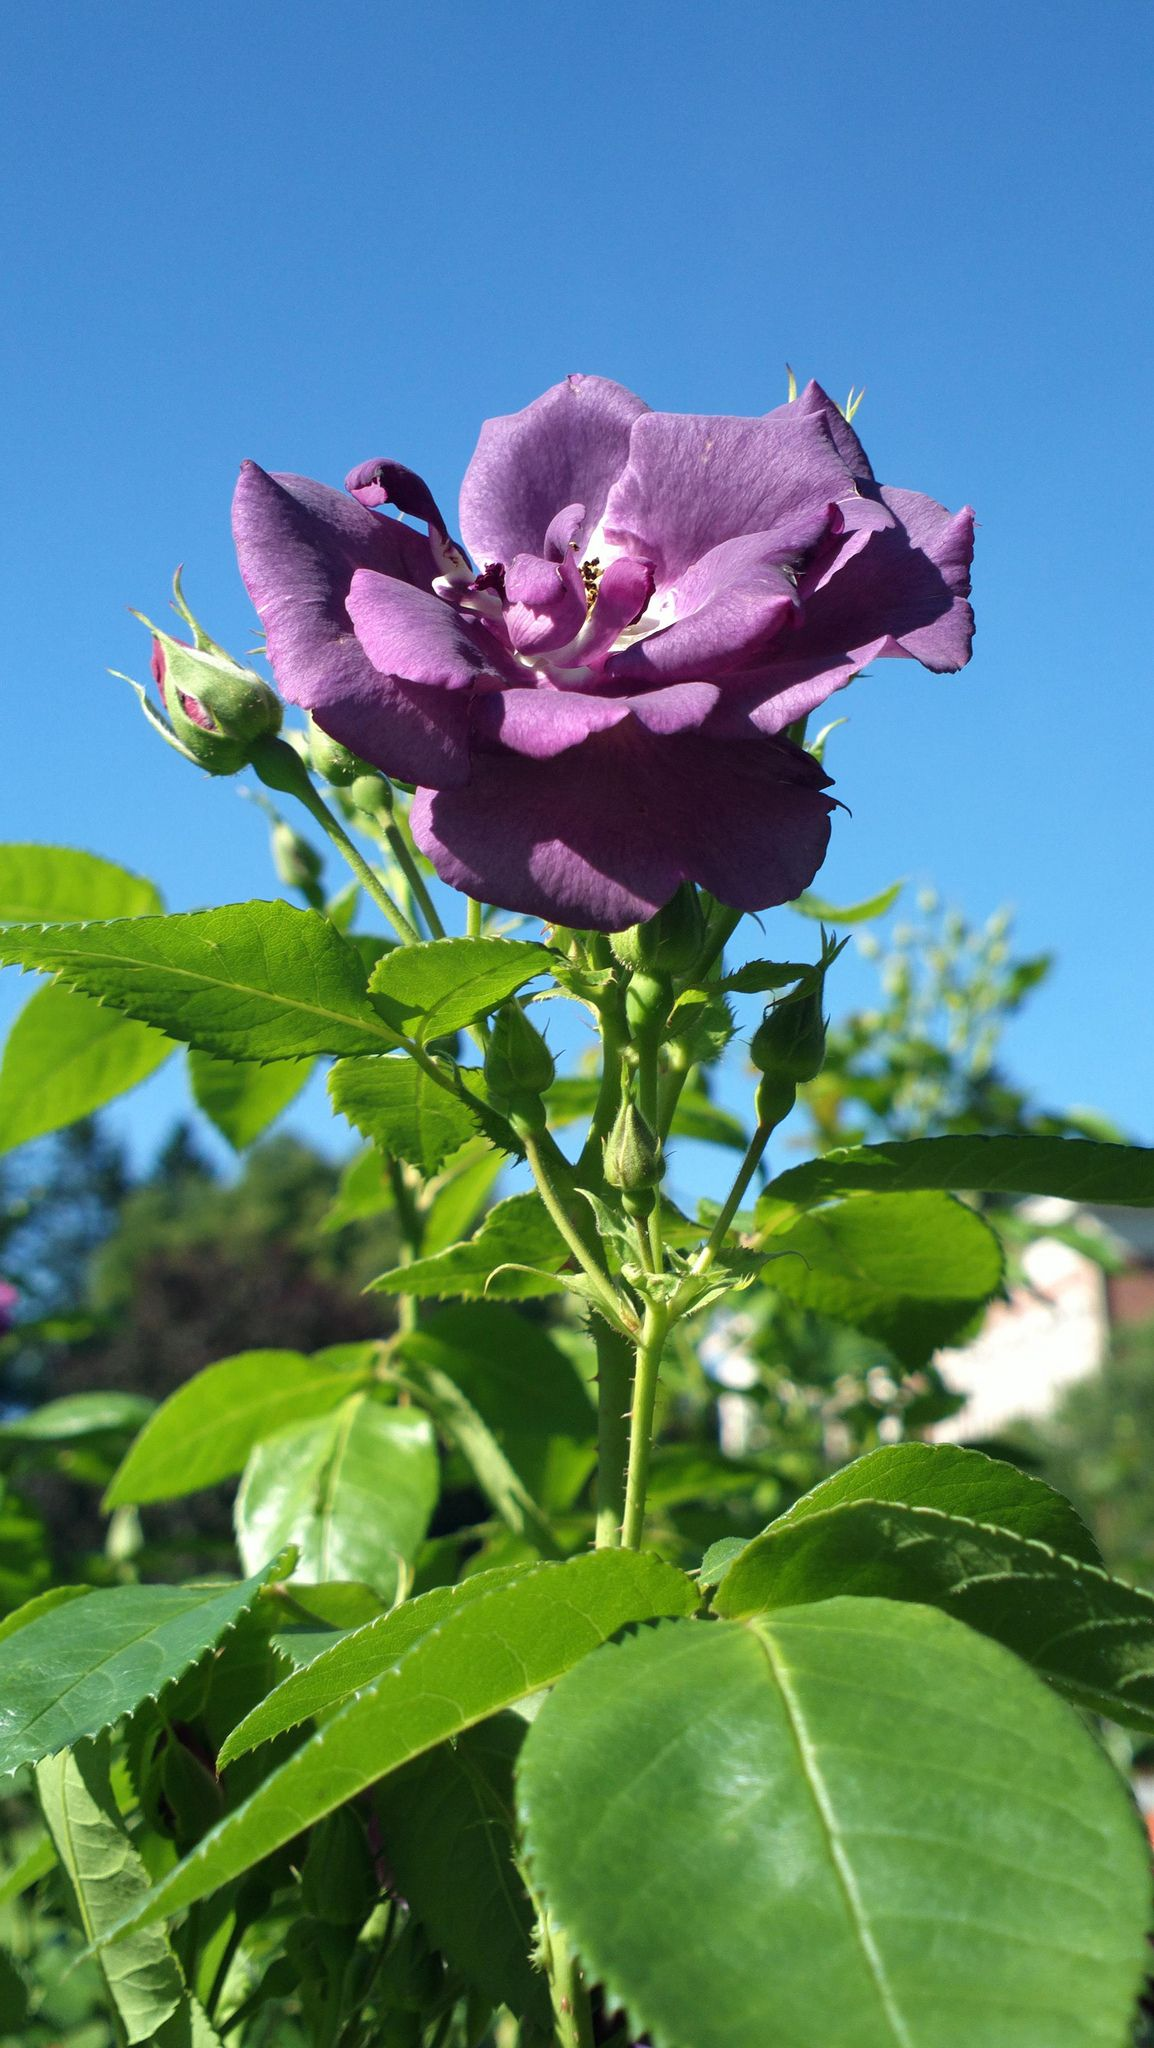 rhapsody in blue landscaping and gardening pinterest rosier planter des fleurs et fleurs. Black Bedroom Furniture Sets. Home Design Ideas